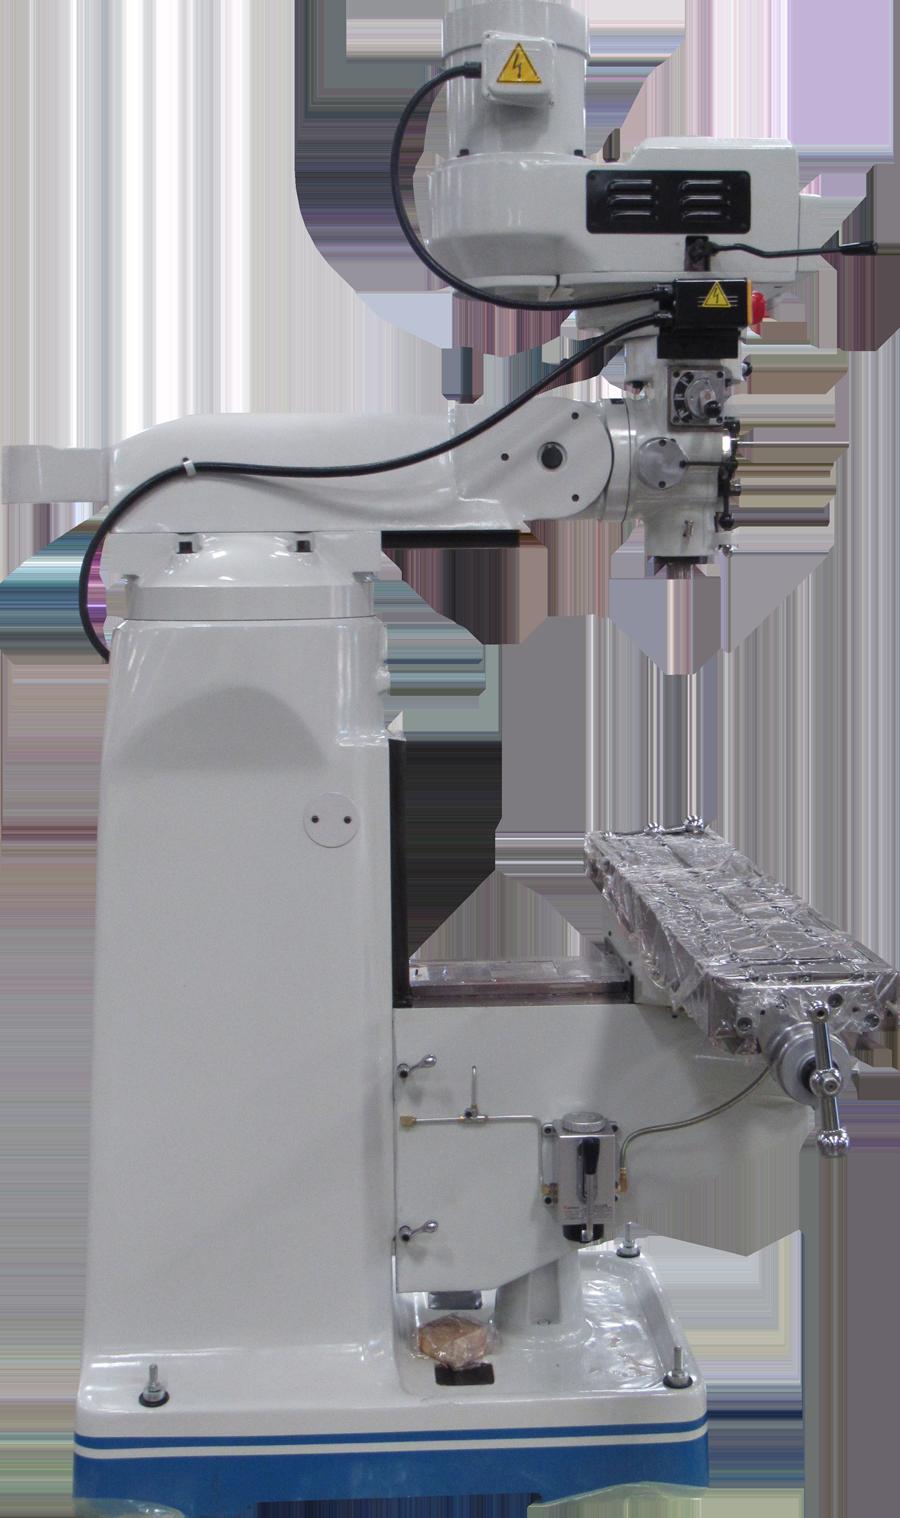 ACRA MODEL 2V VERTICAL VARIABLE SPEED MILLING MACHINE